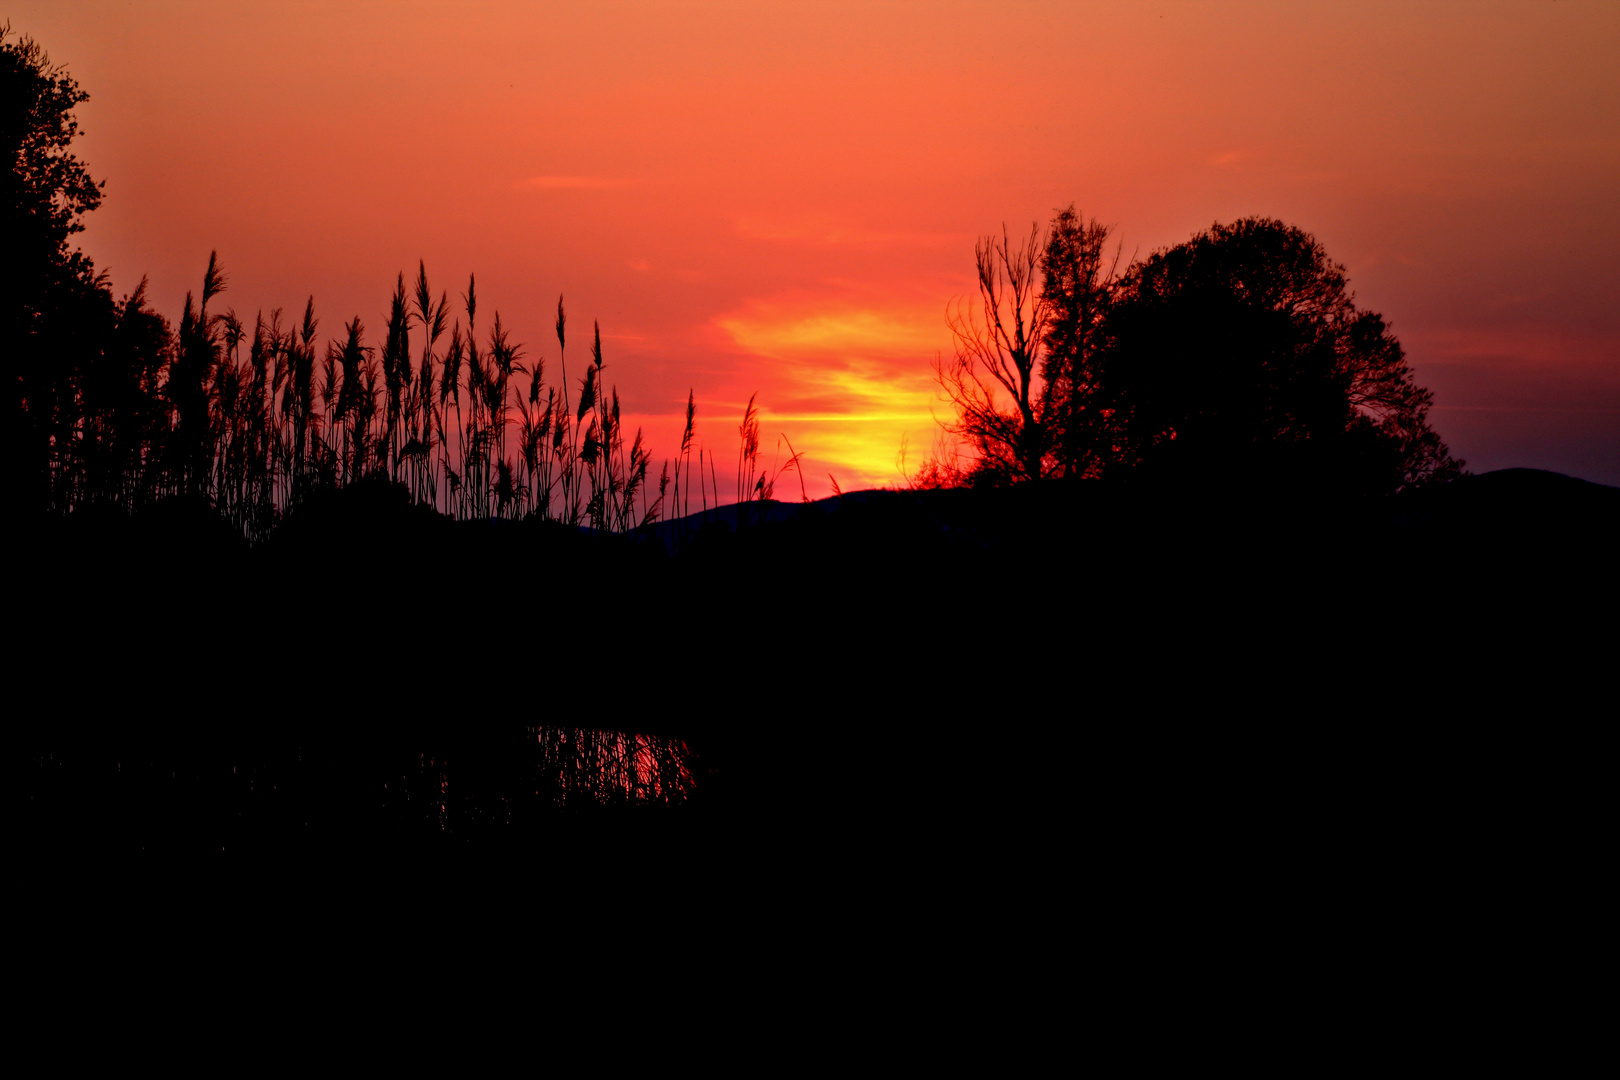 Ipoly - Sonnenuntergang im Frühling 2